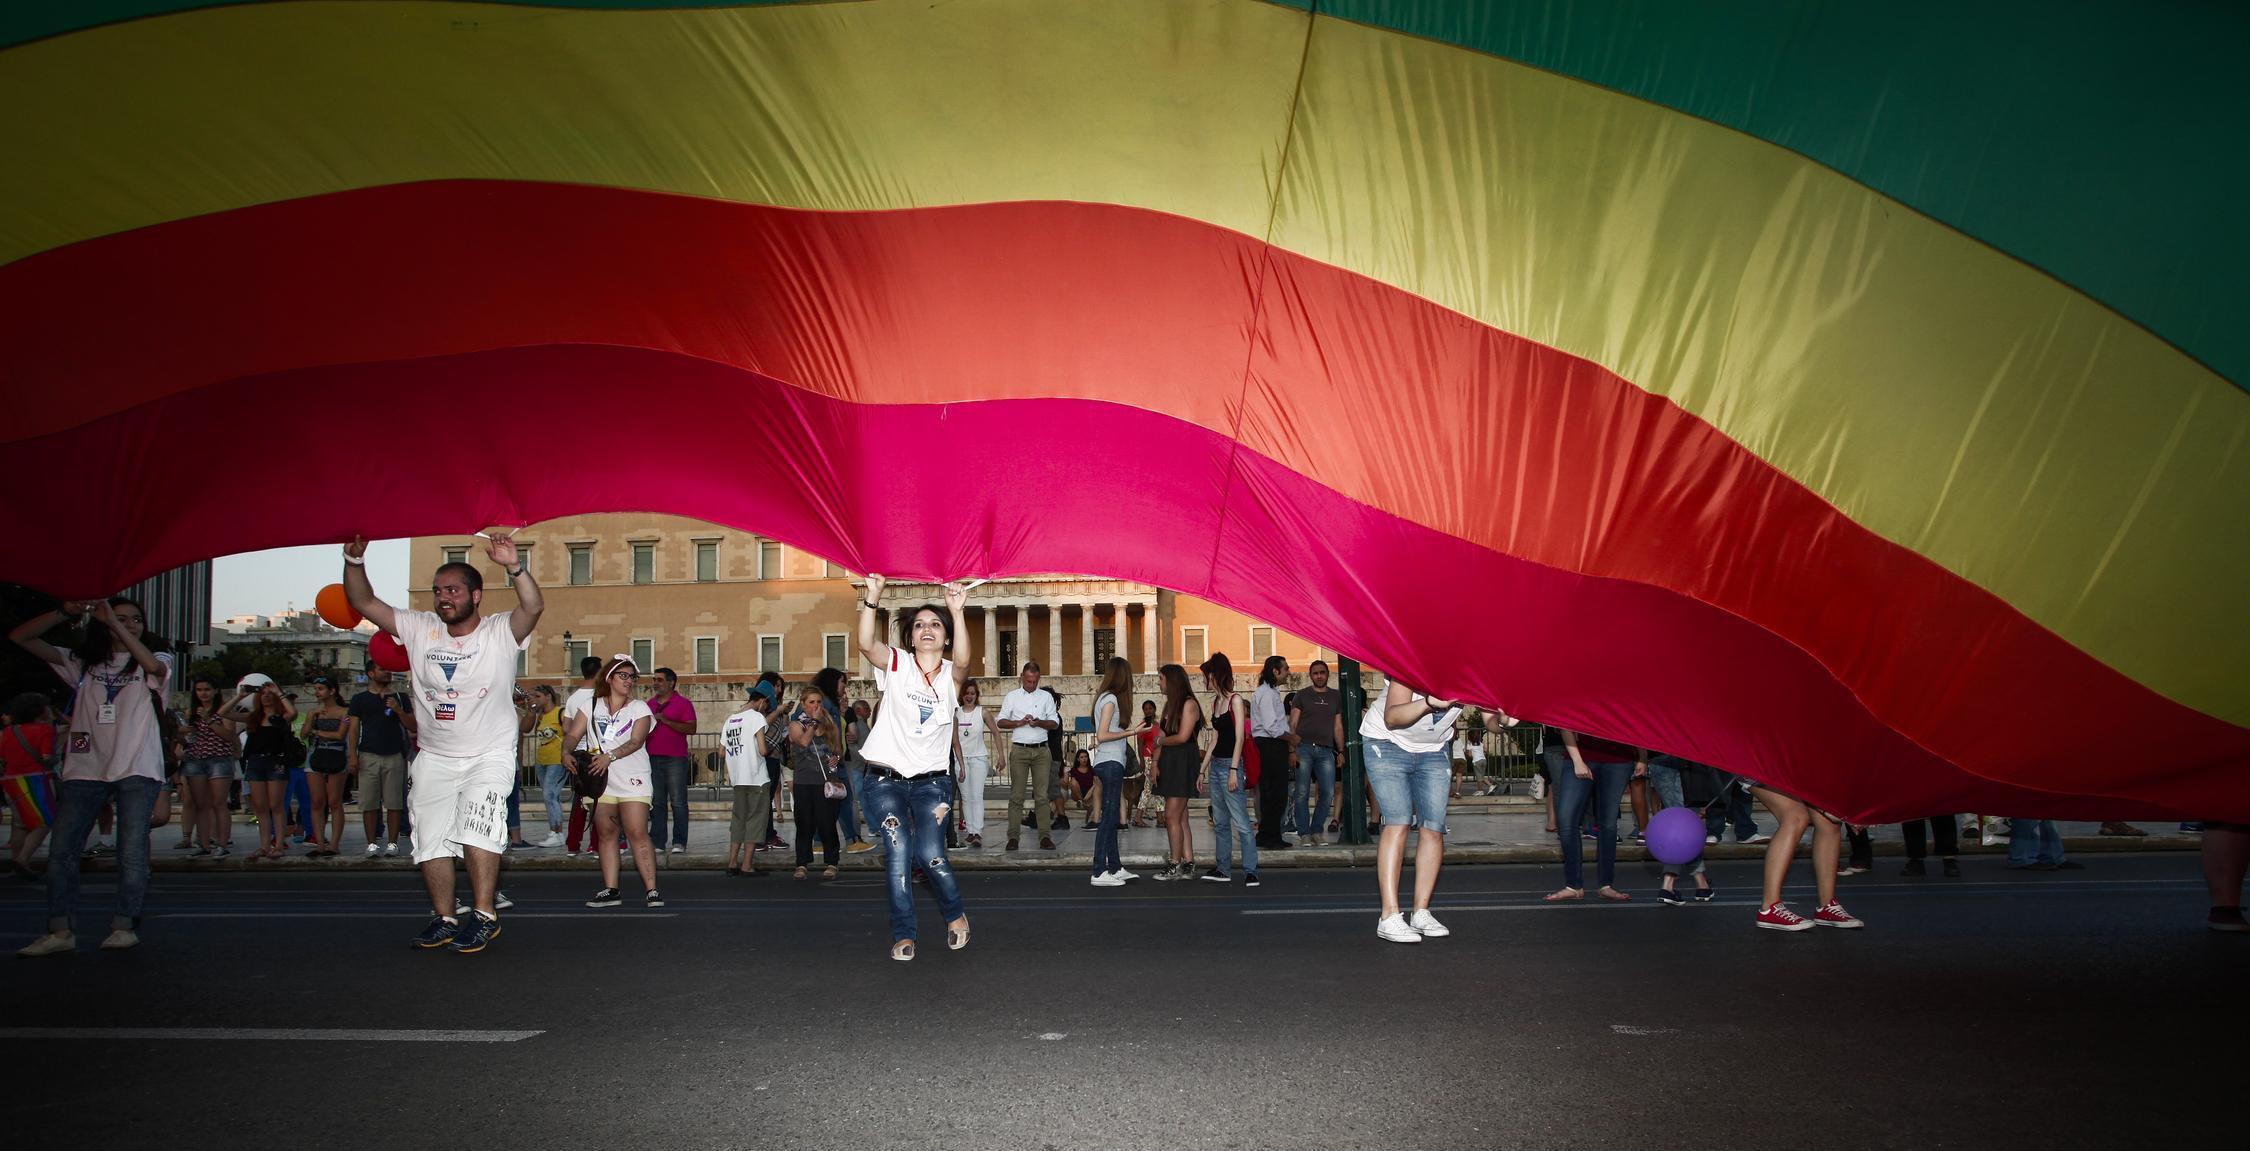 Ten Years Anniversary Of The  Athens Gay Pride,on June 14,2014  / Δέκατη επετειακή διοργάνωση του Φεστιβάλ Υπερηφάνειας της Αθήνα στις 14 Ιουνίου 2014